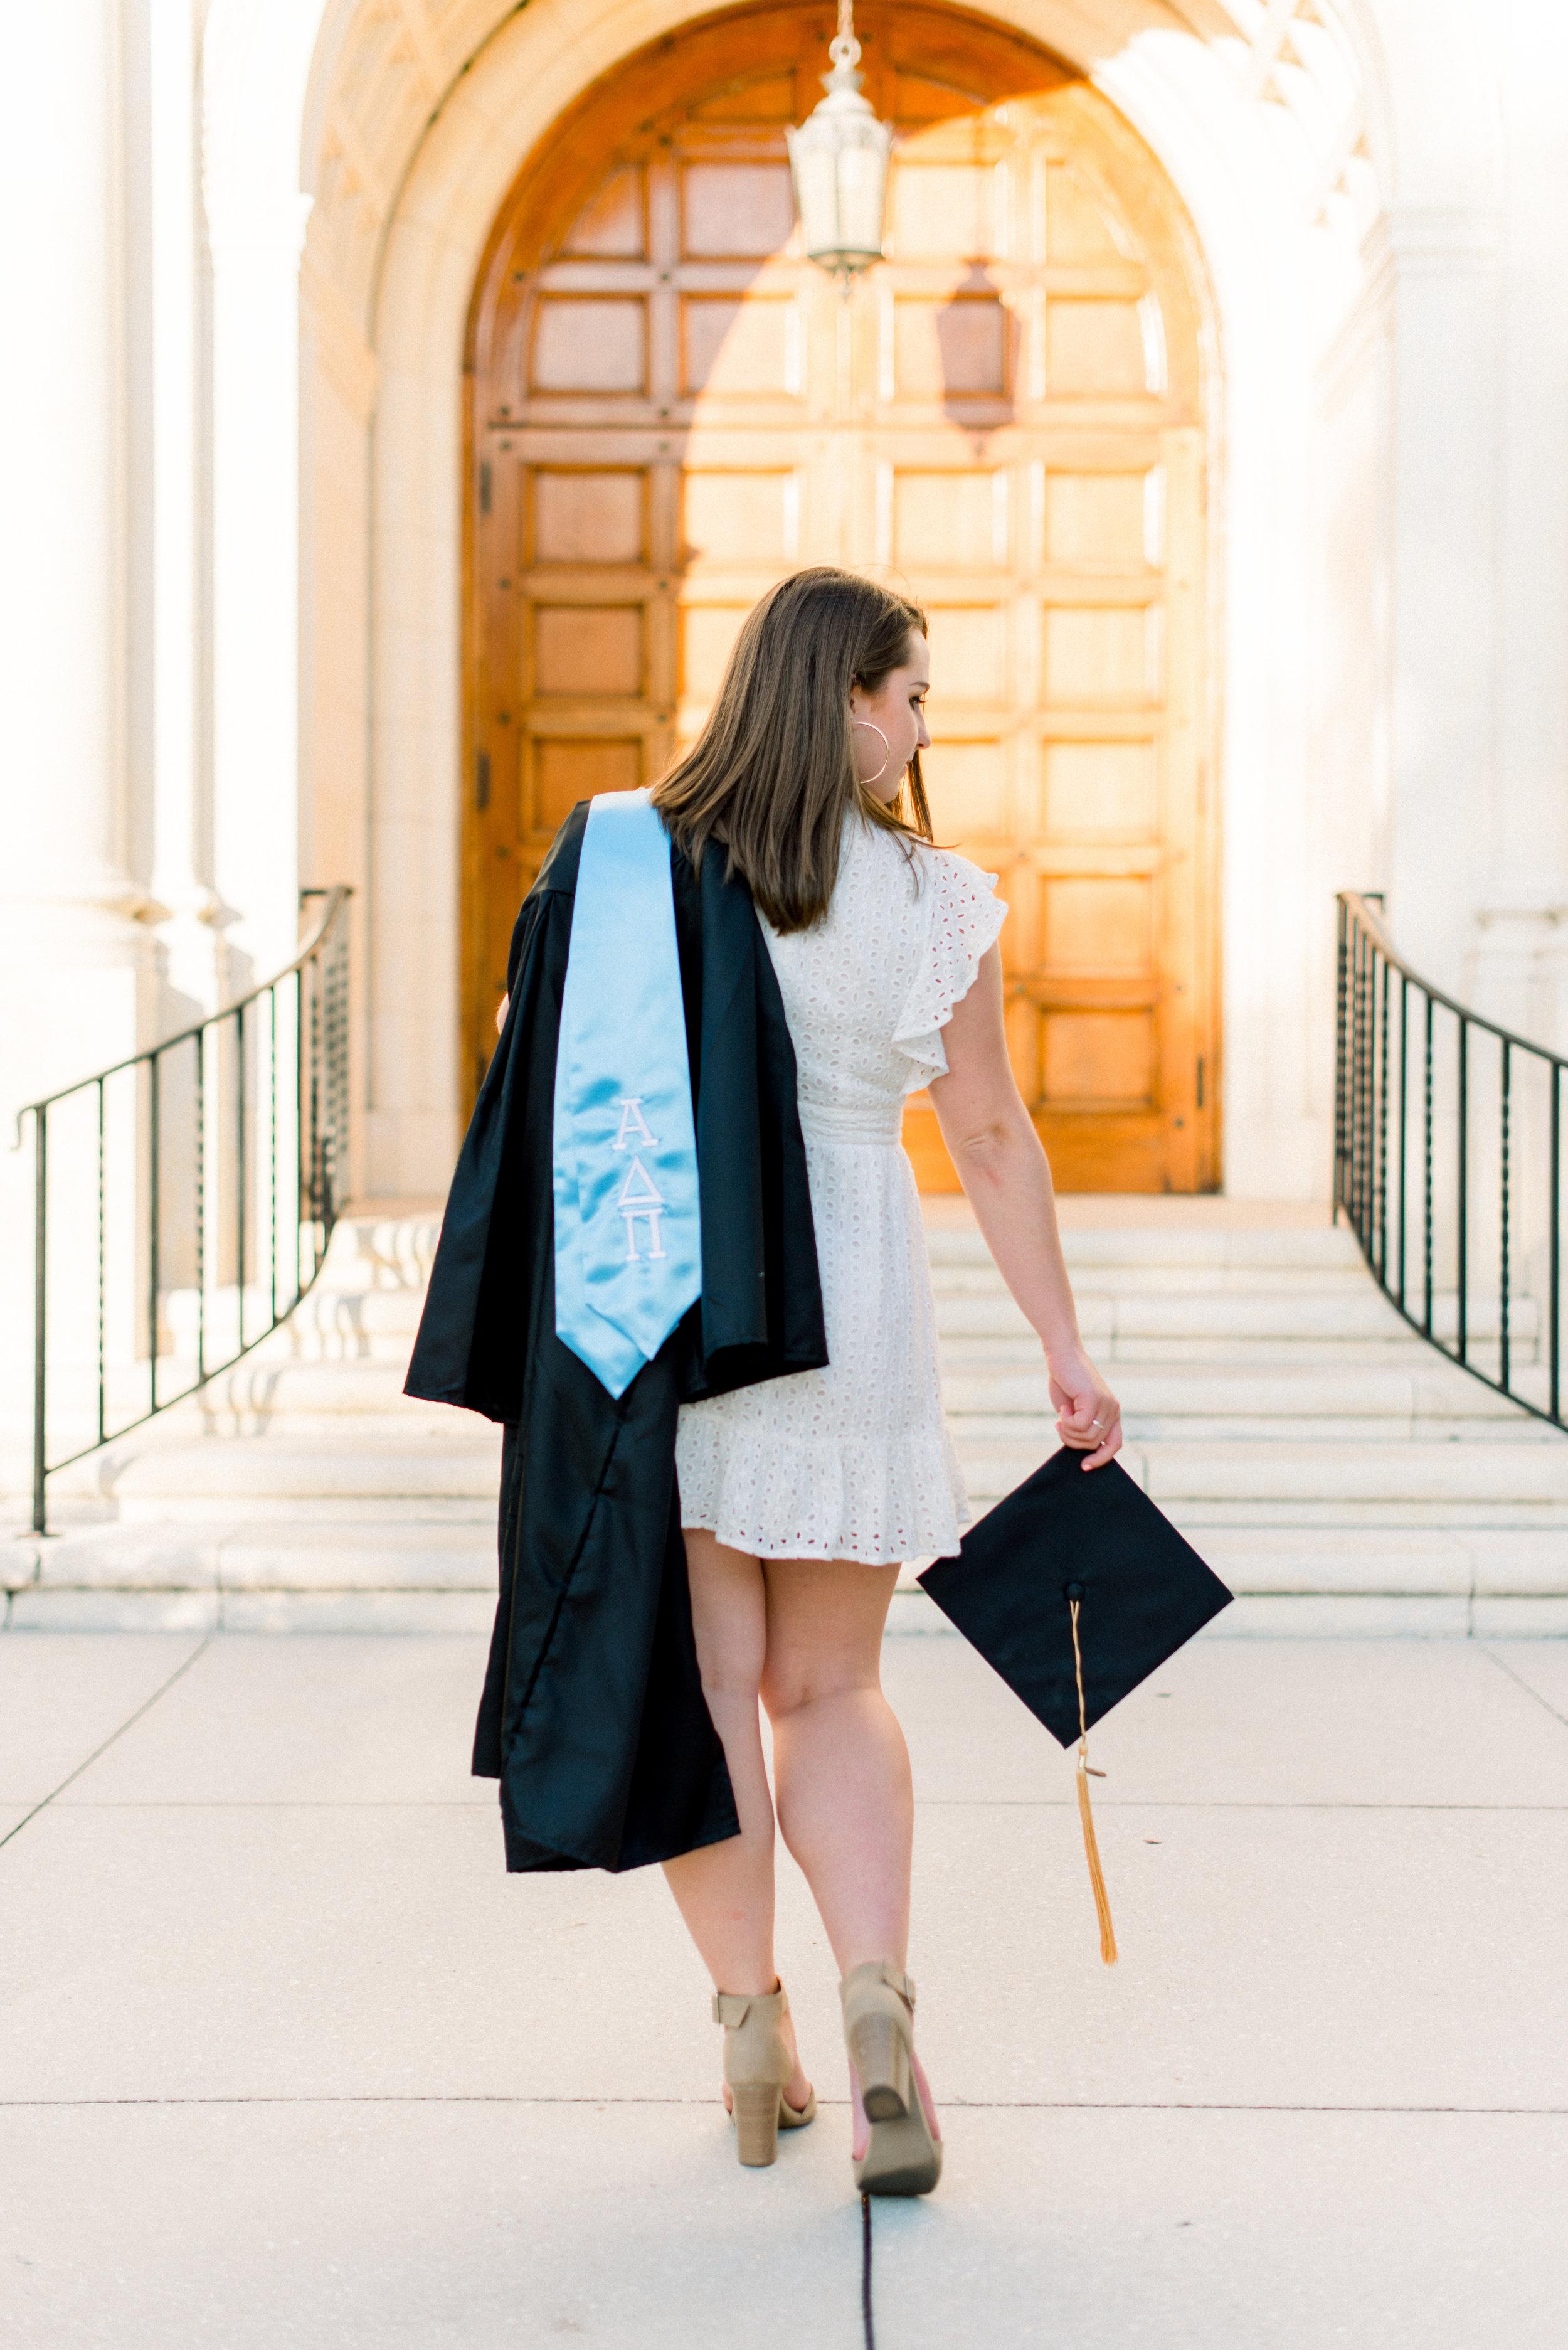 KateTaramykinStudios-Rollins-College-Grad-Portraits-Kristine-27.jpg